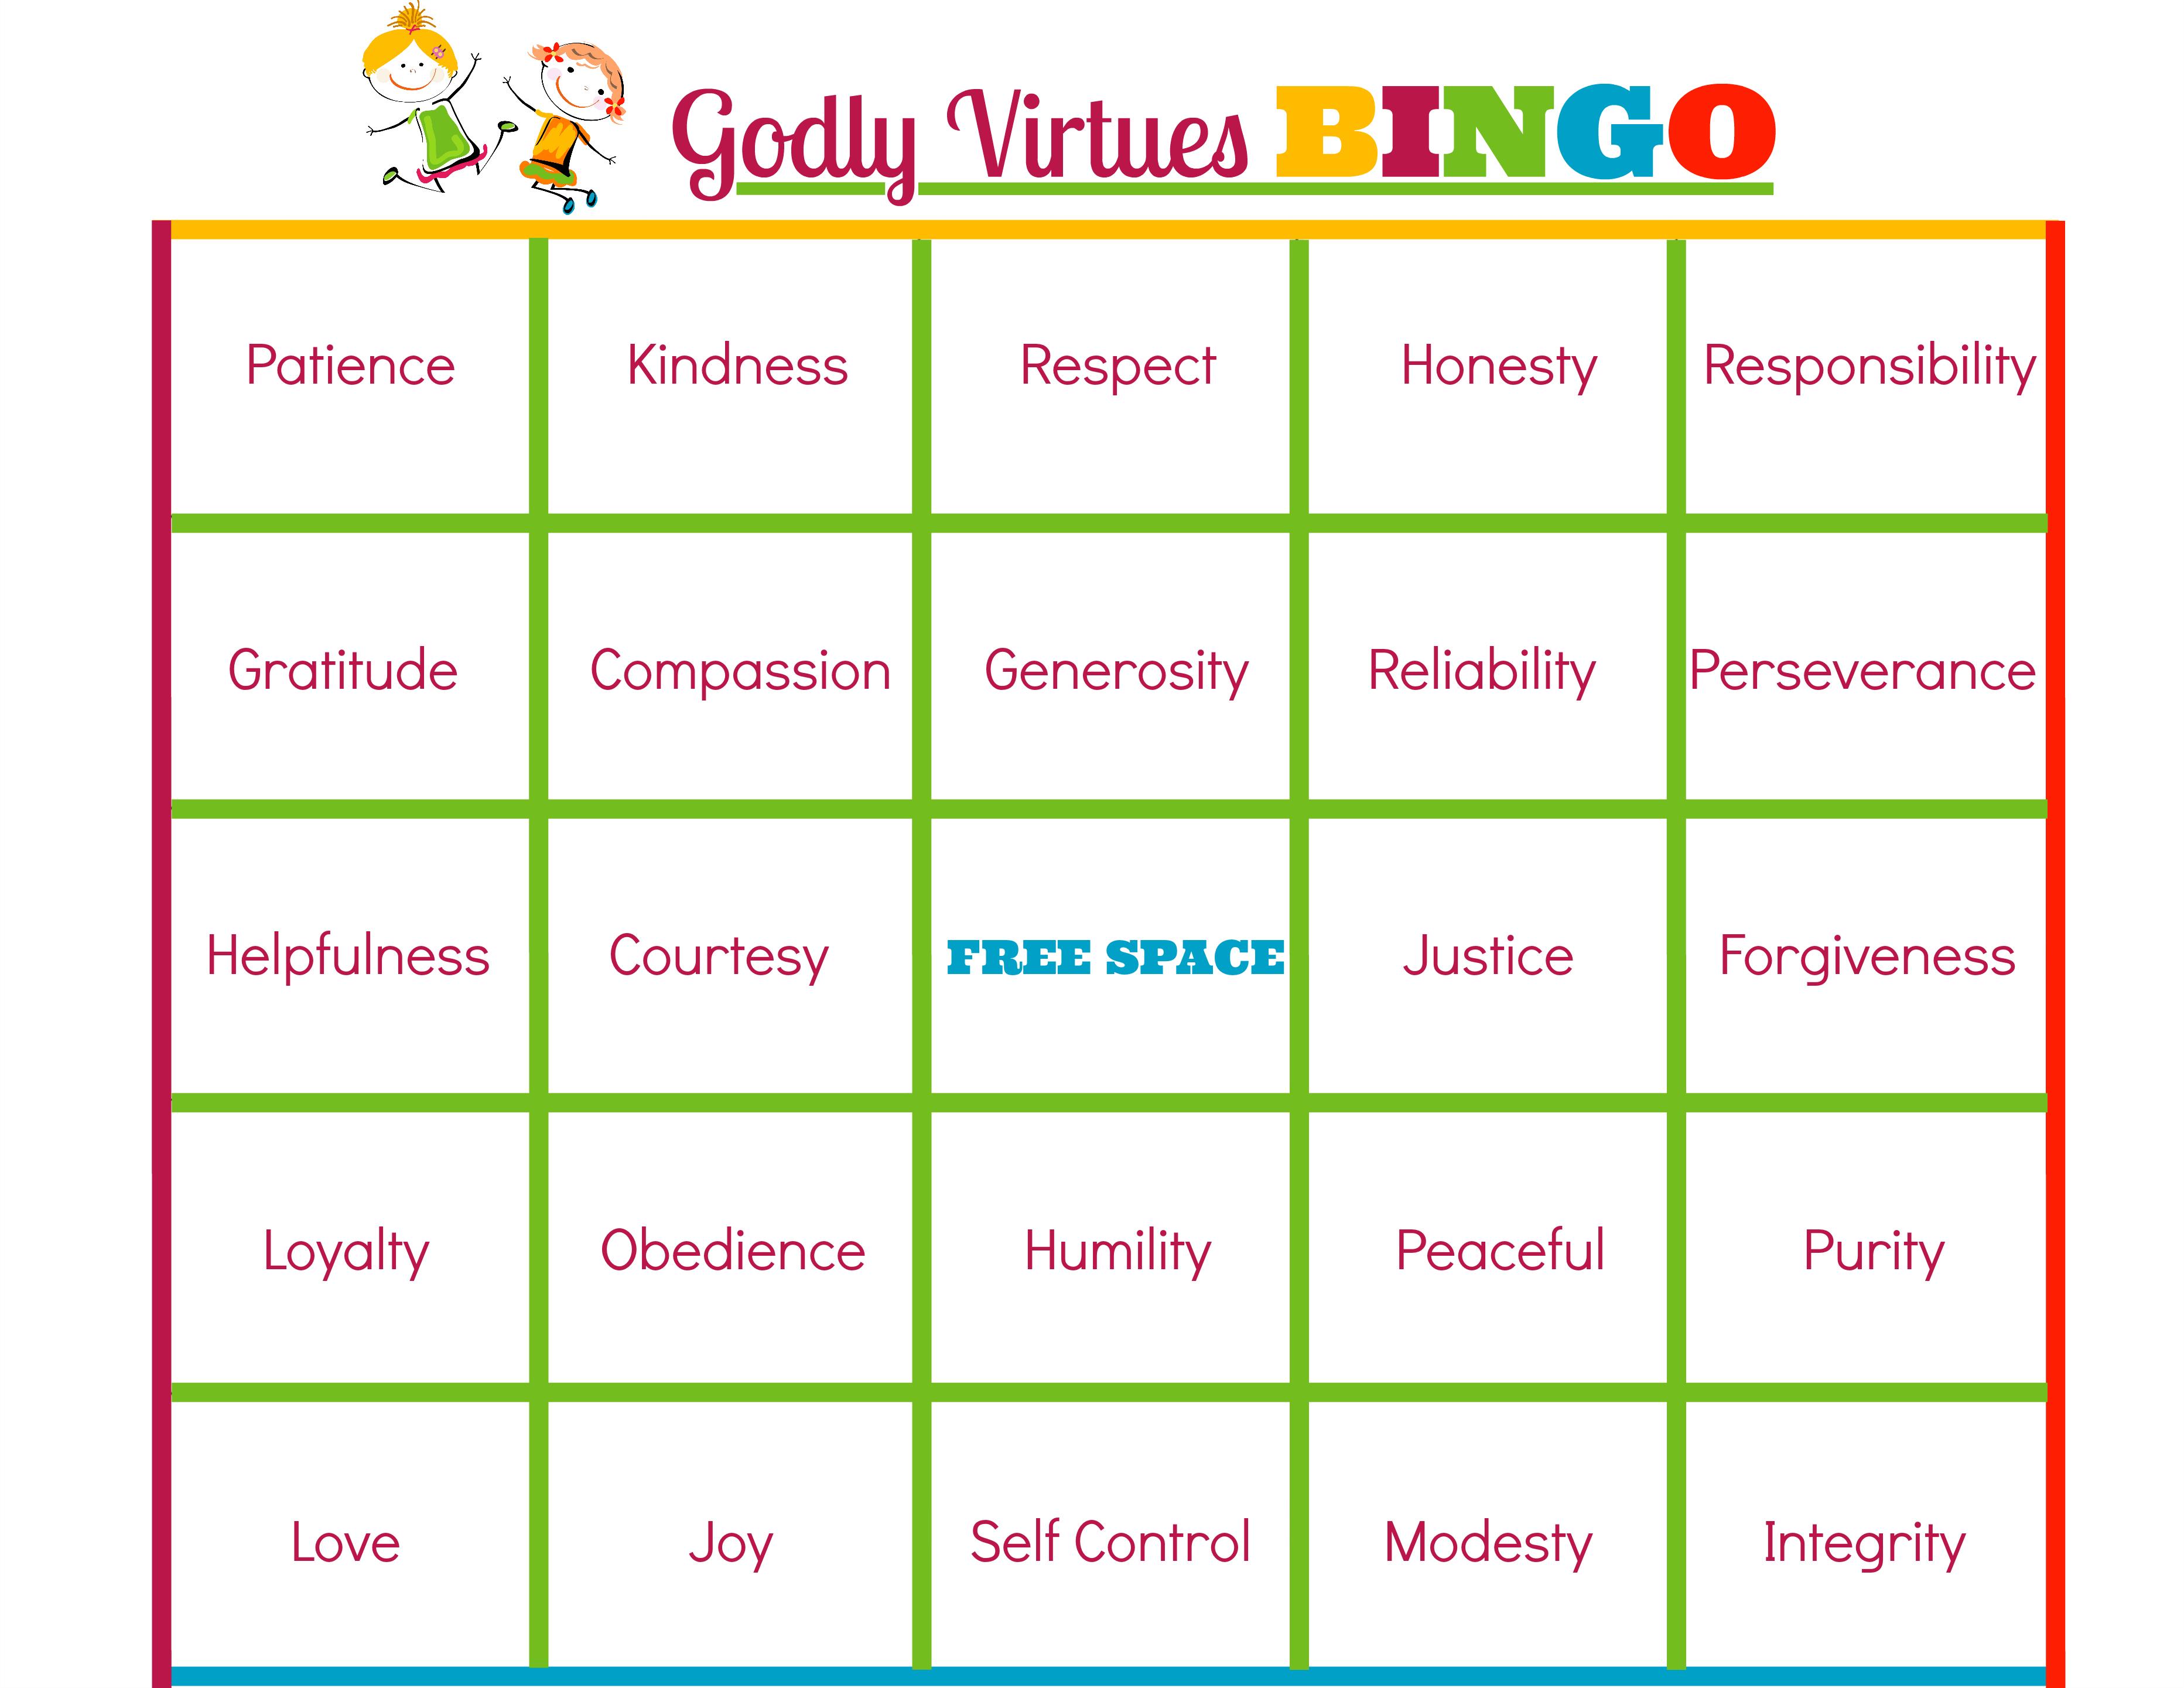 Bible Bingo Printable (91+ Images In Collection) Page 1 - Free Printable Bible Bingo For Preschoolers